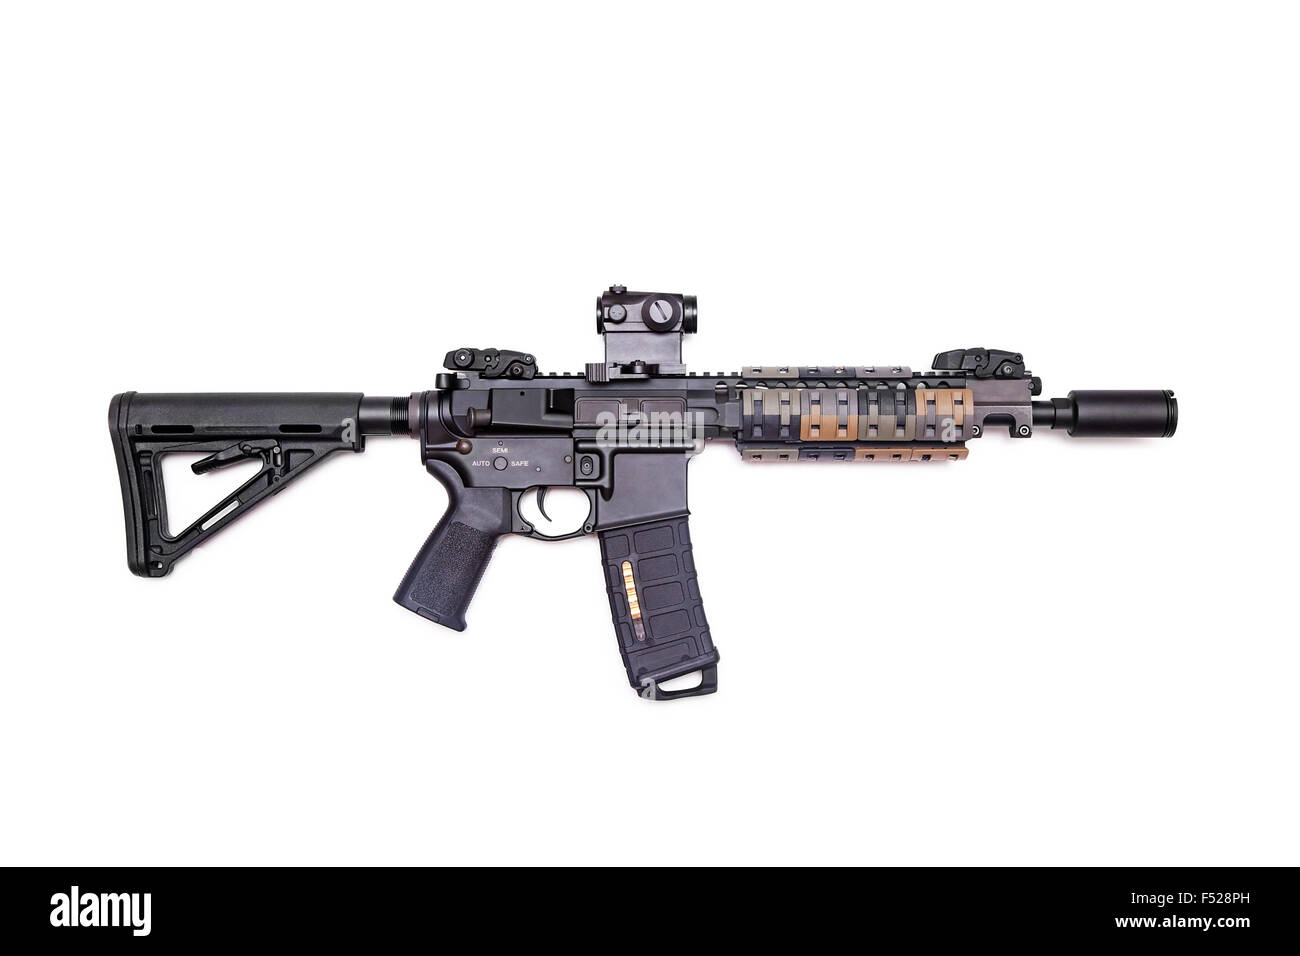 The Black Rifle: custom build 9' AR-15 SBR isolated on a white background, studio shot - Stock Image